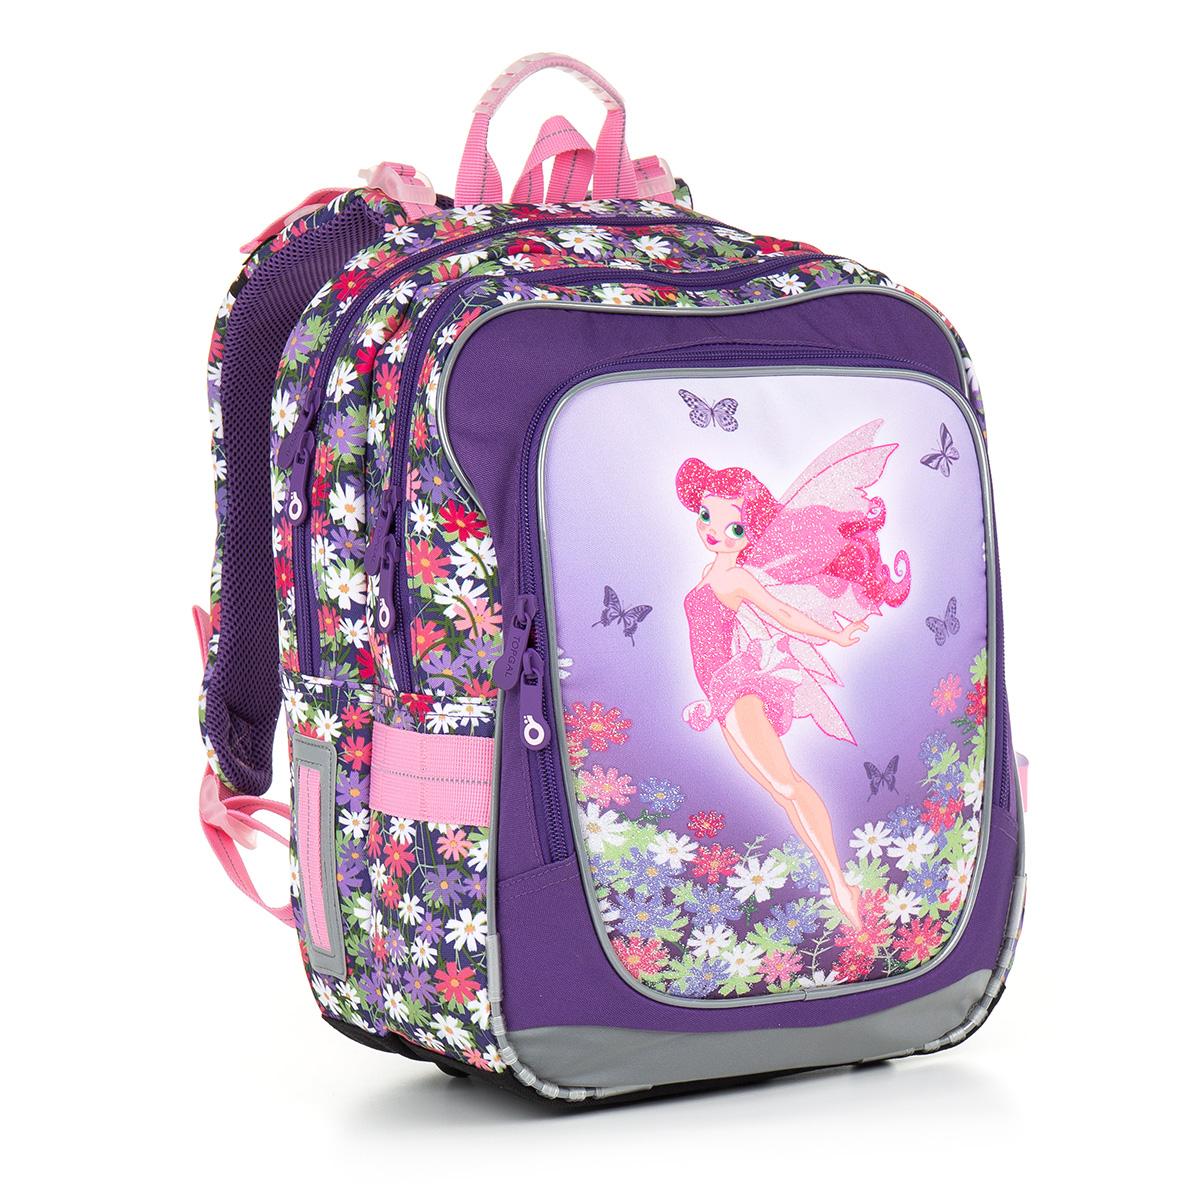 Topgal školni batoh CHI 879 I - Violet